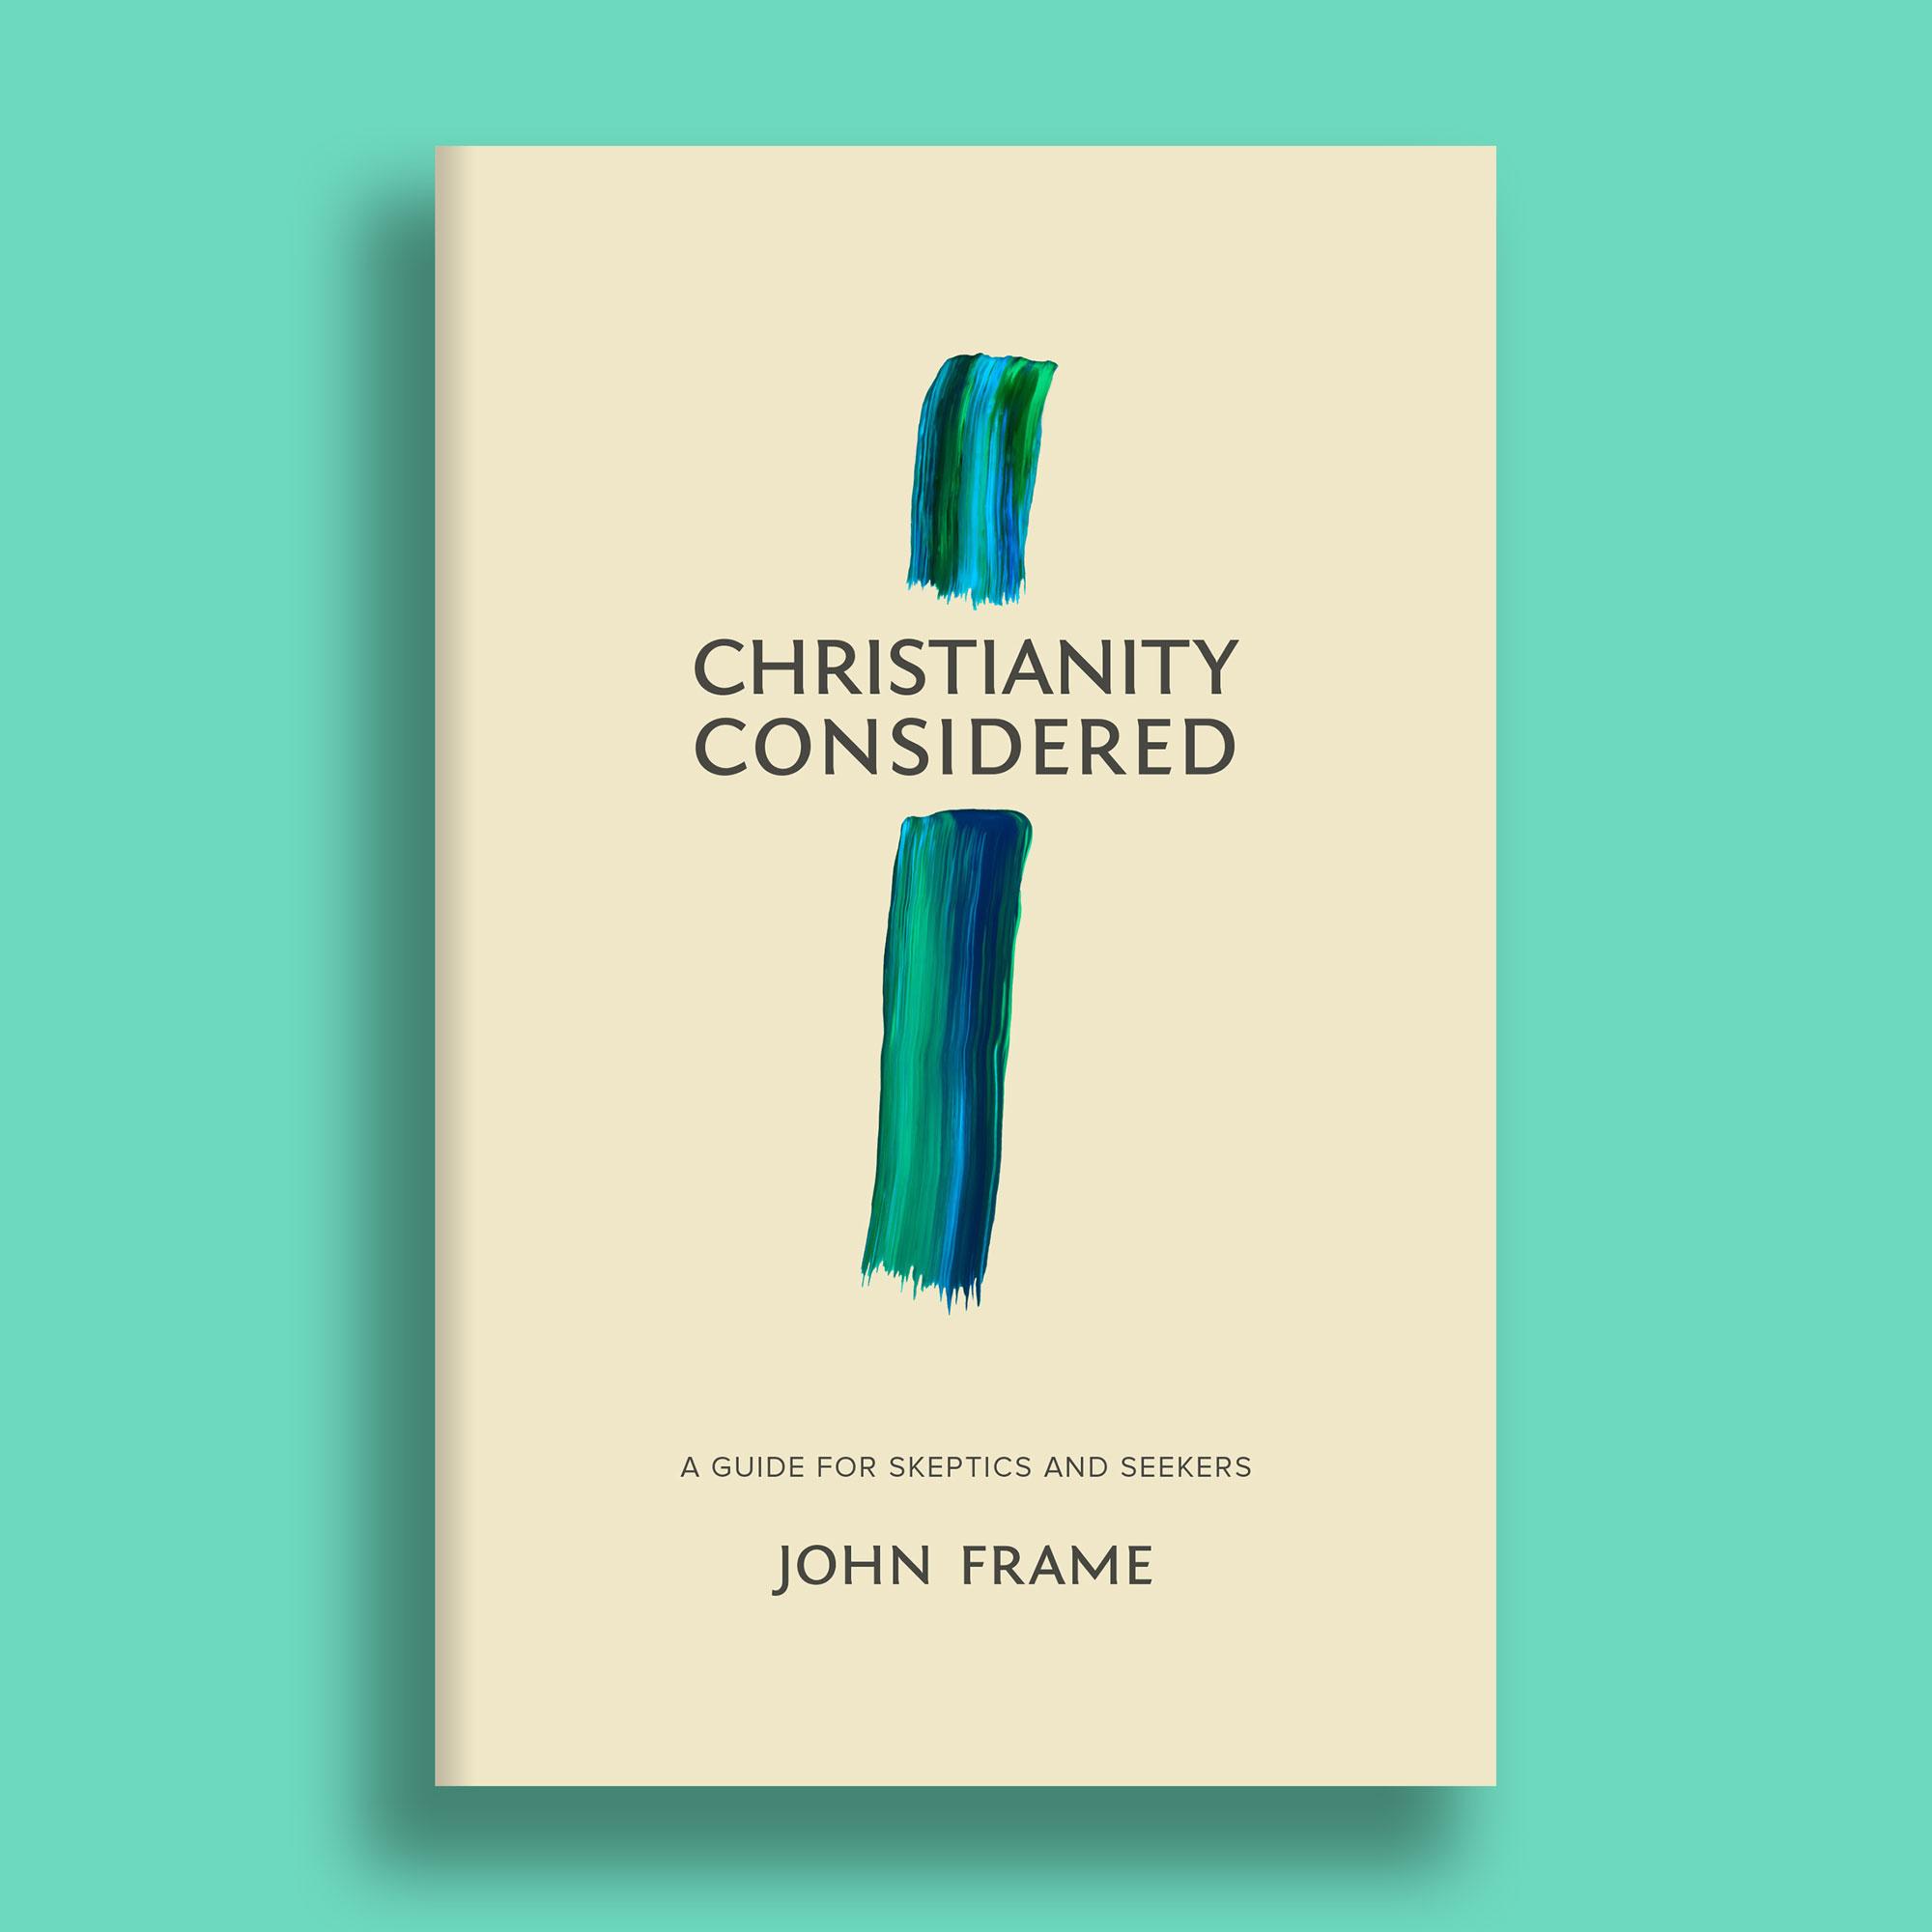 Christianity-Considered_Jim_LePage.jpg